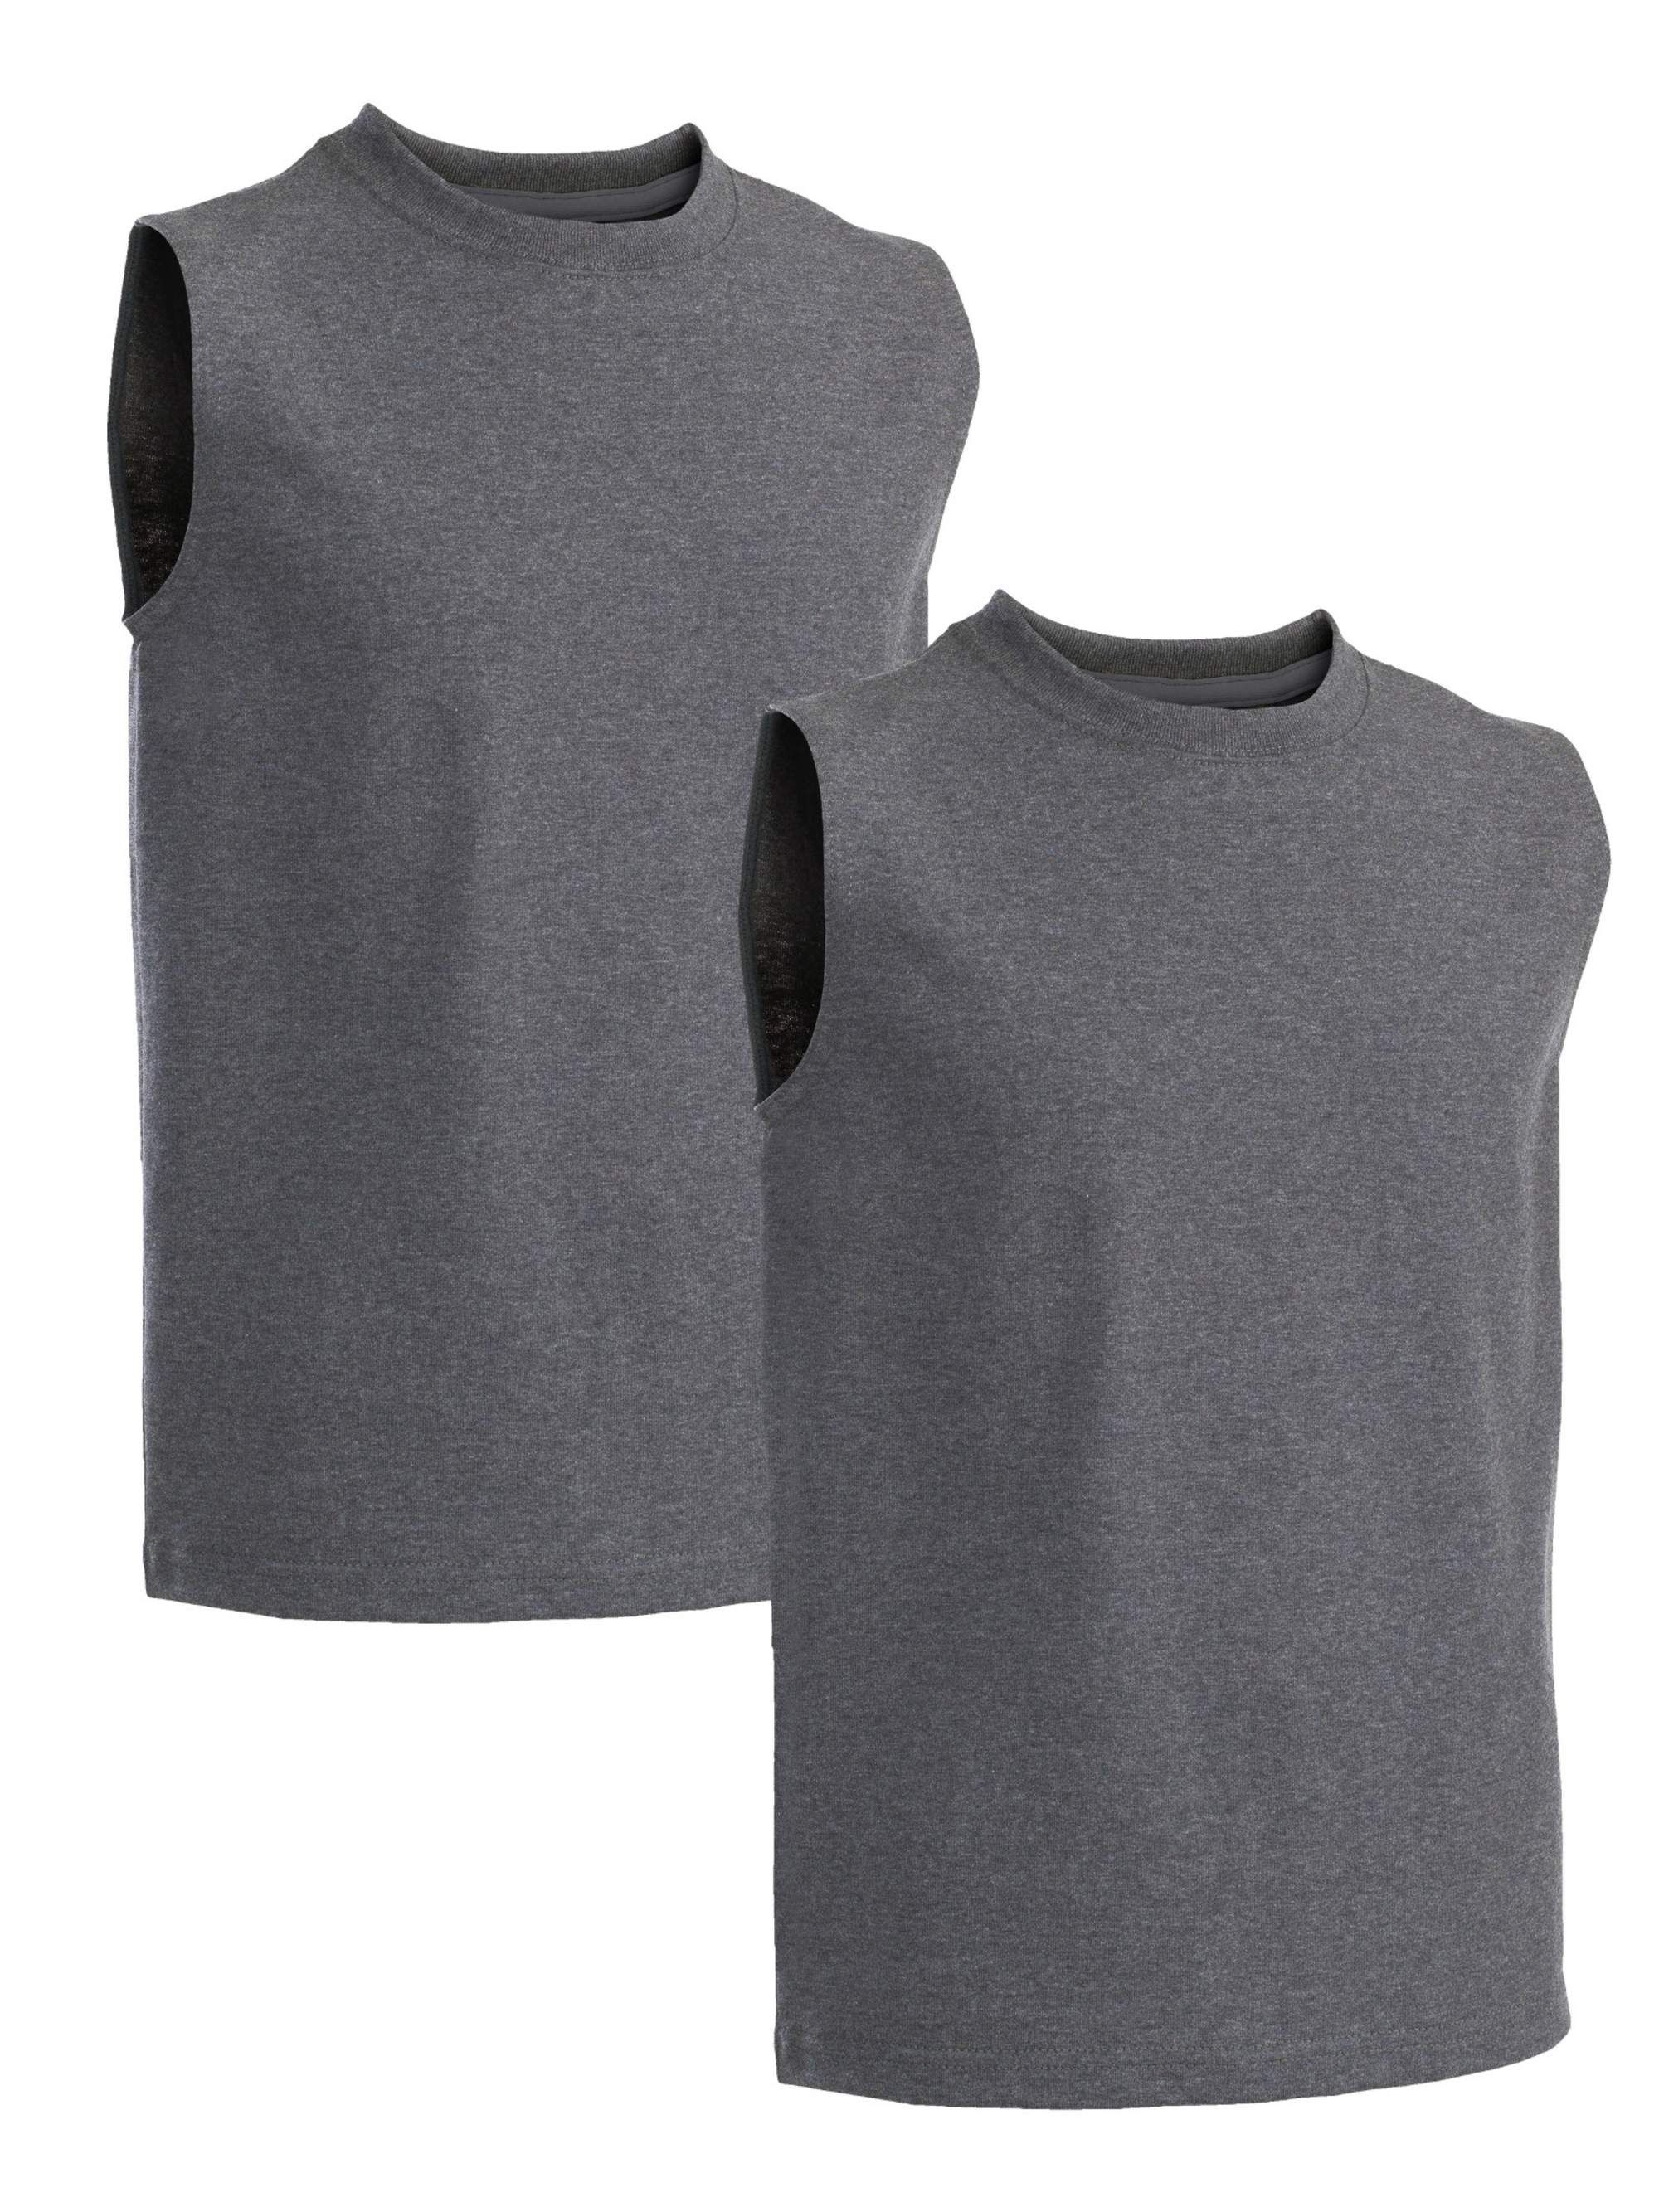 Boys' Hemmed Armhole Sleeveless T-Shirts, 2 Pack